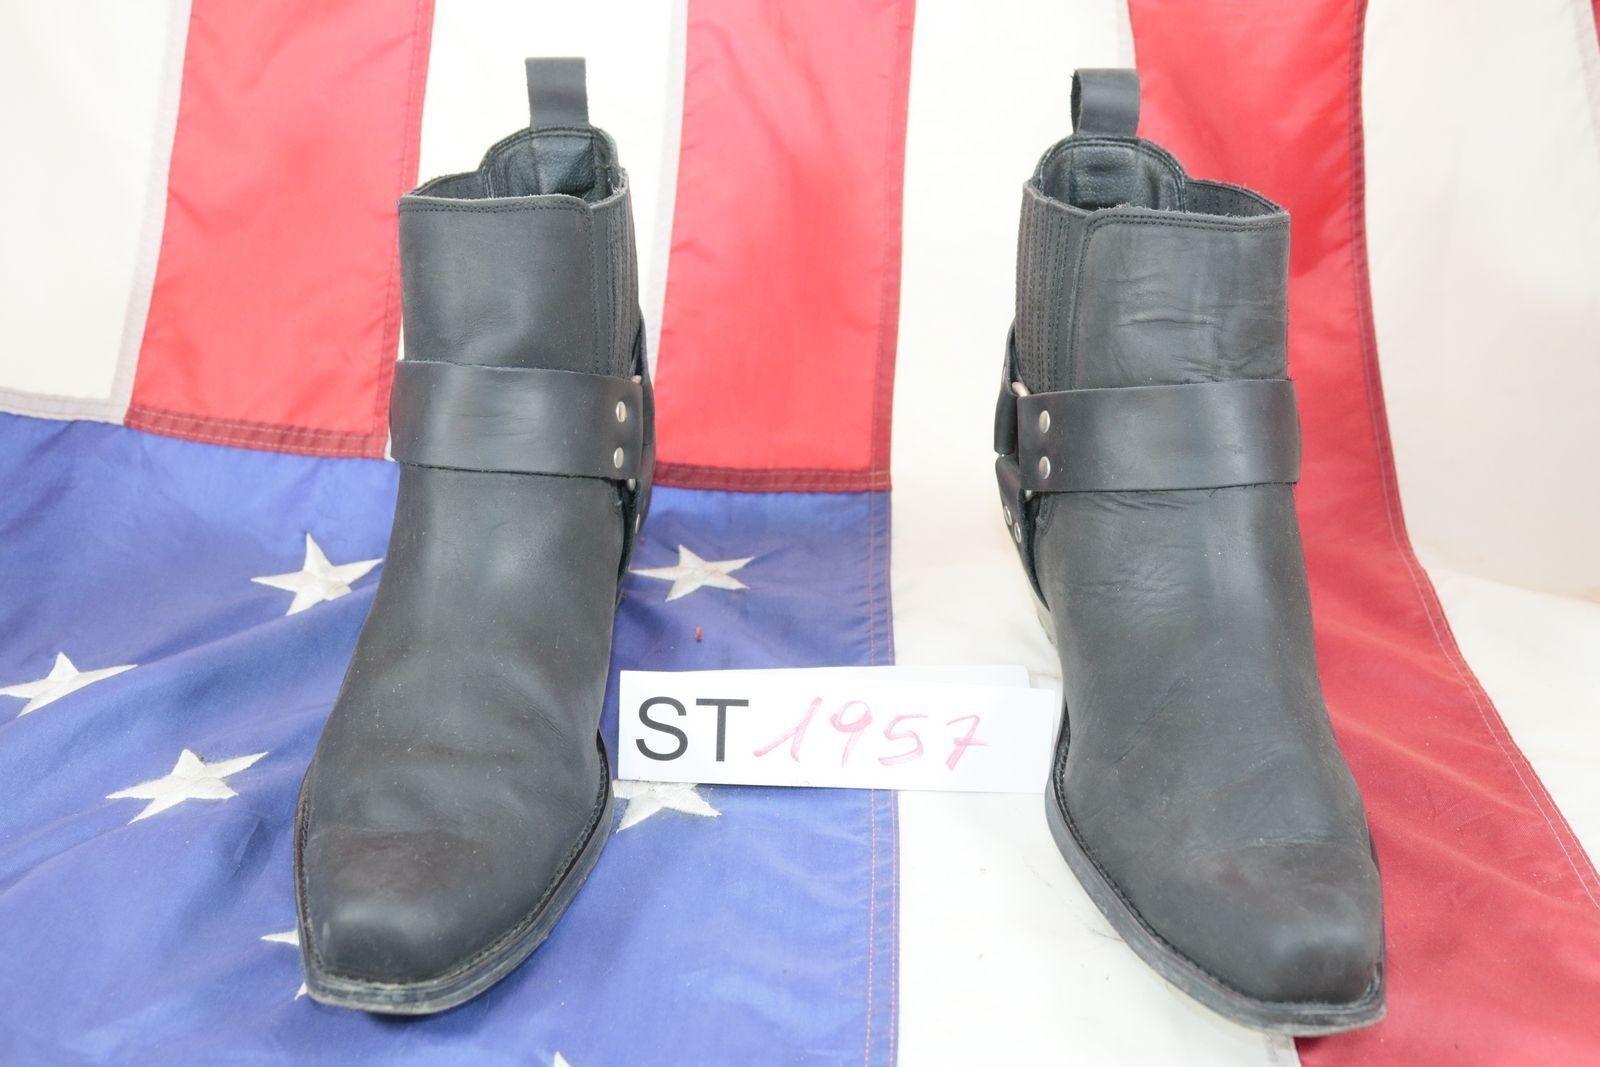 Stivali JOHNNY BULLS (Cod. ST1957) USATO N.46 men pelle black Cowboy Country